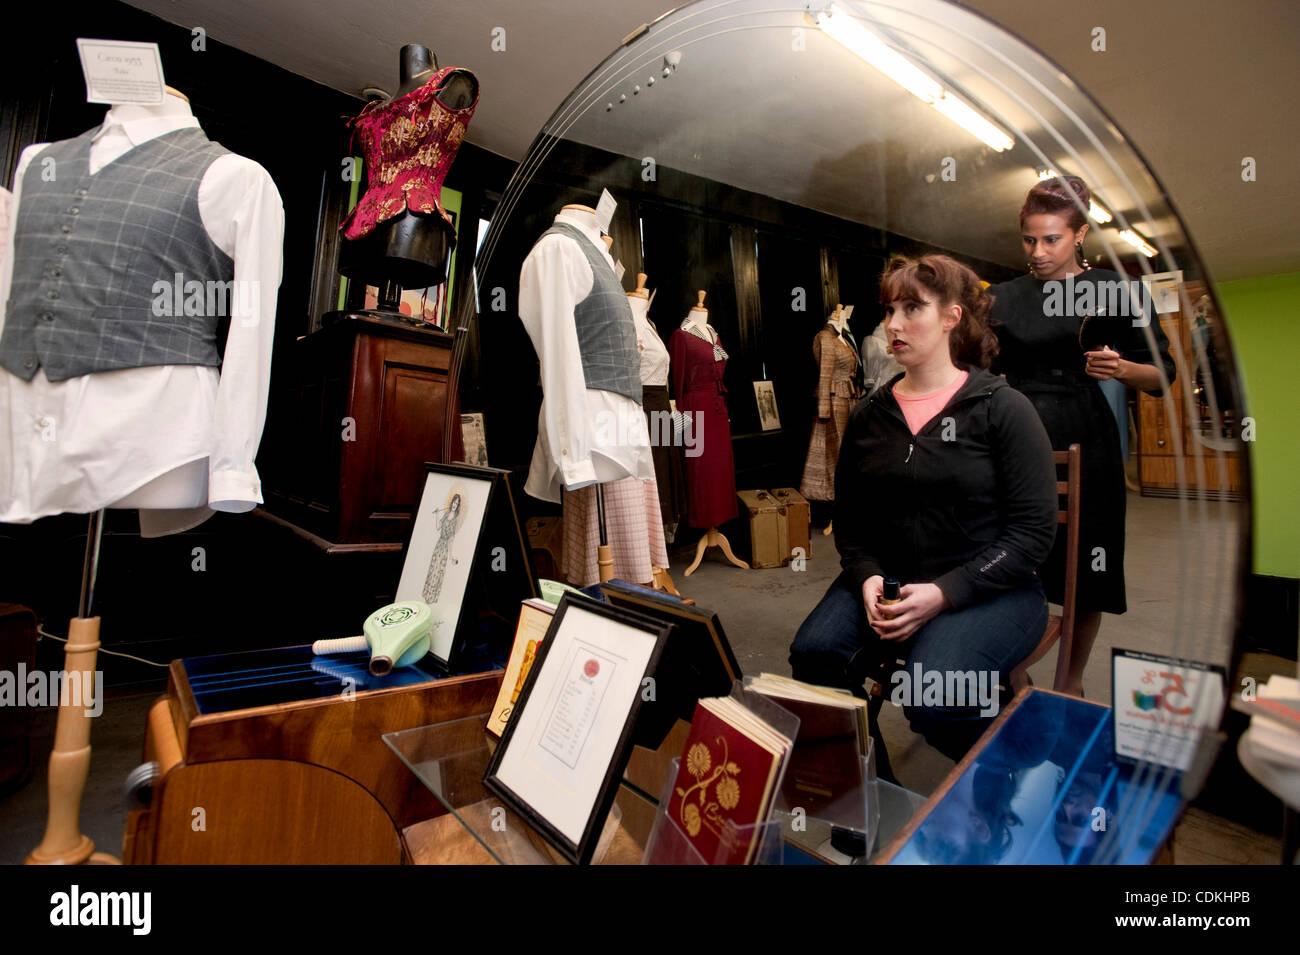 20 Marz 2011 Los Angeles Kalifornien Usa Friseur Die Sandra